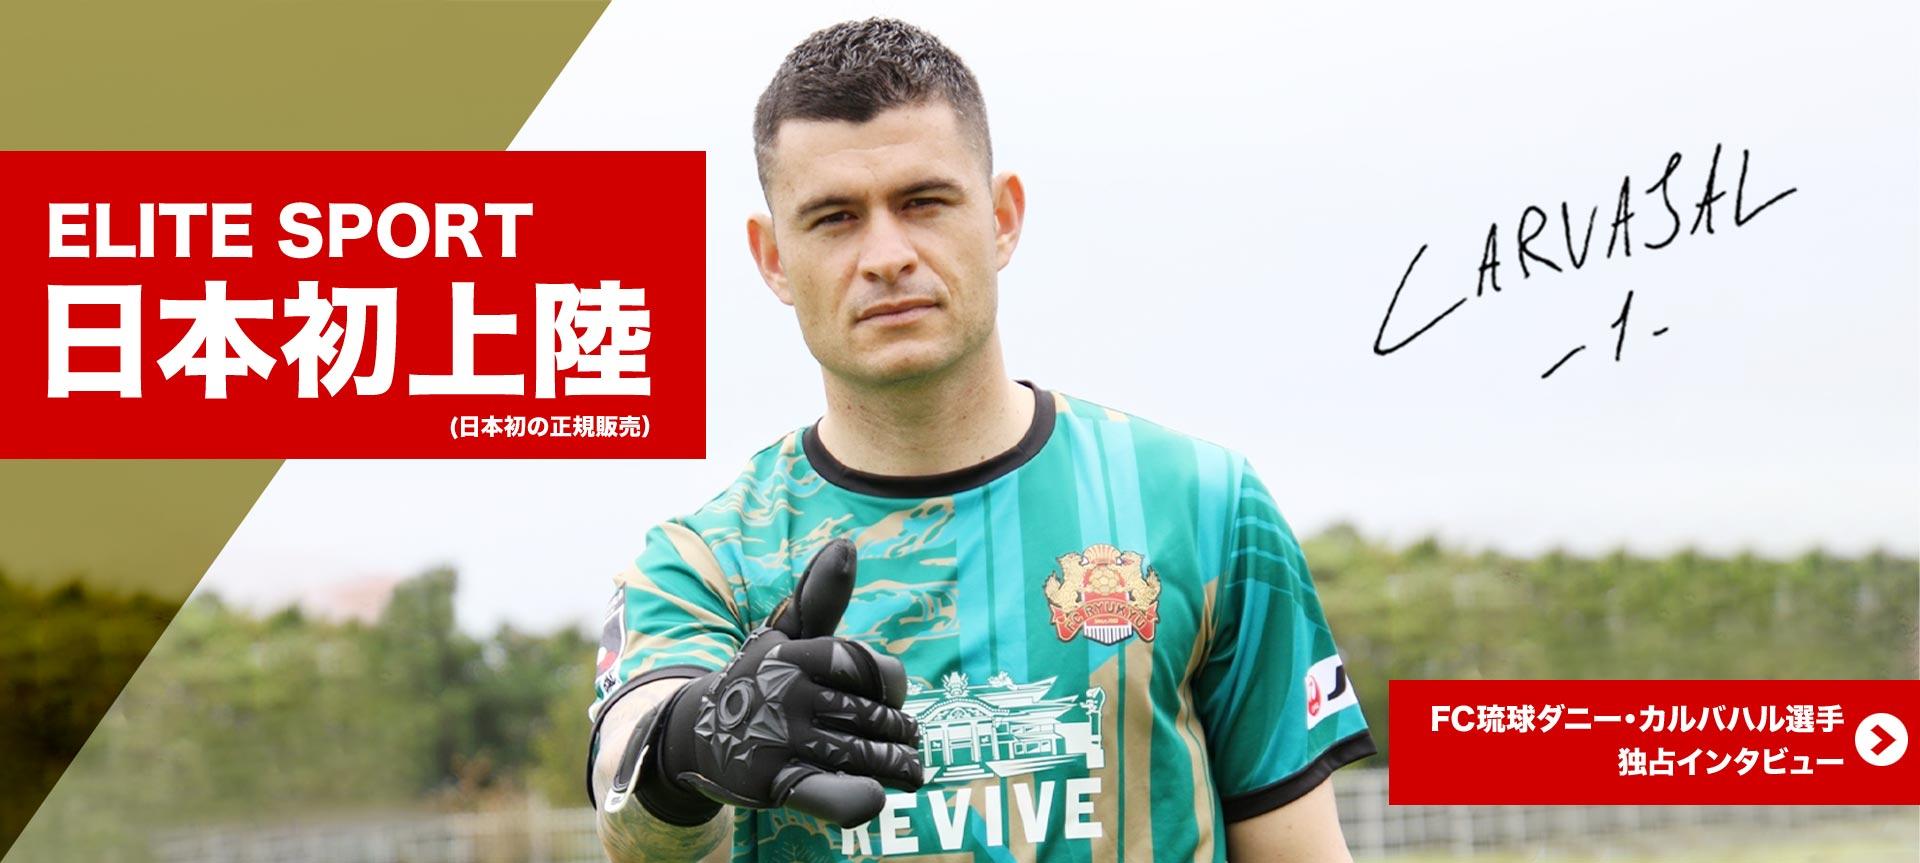 ELITE SPORT日本初上陸 「FC琉球ダニー・カルバハル選手独占インタビュー」